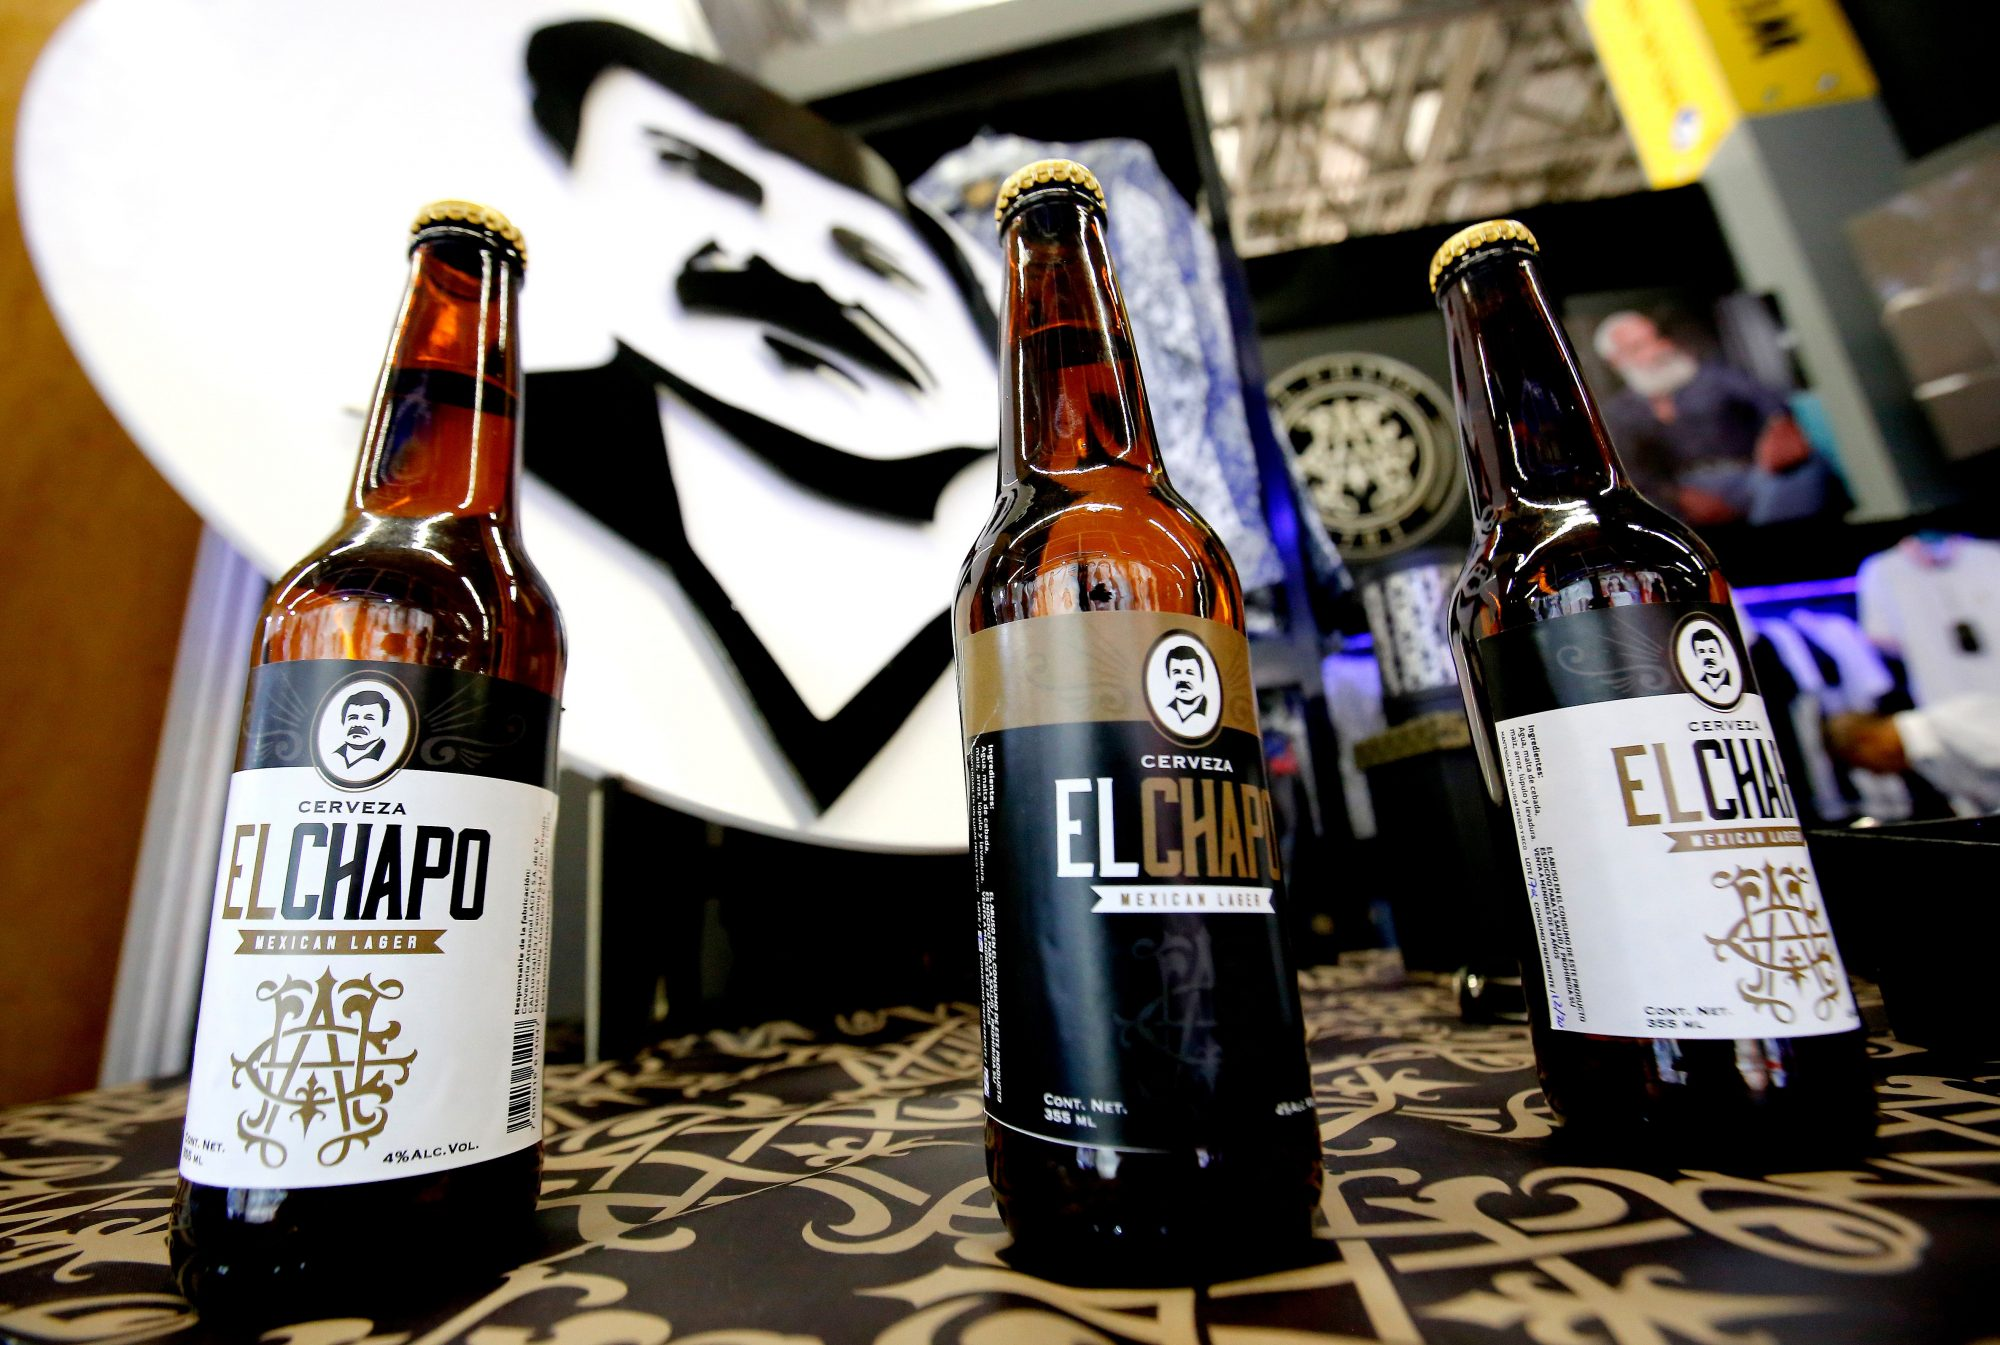 Cerveza El Chapo